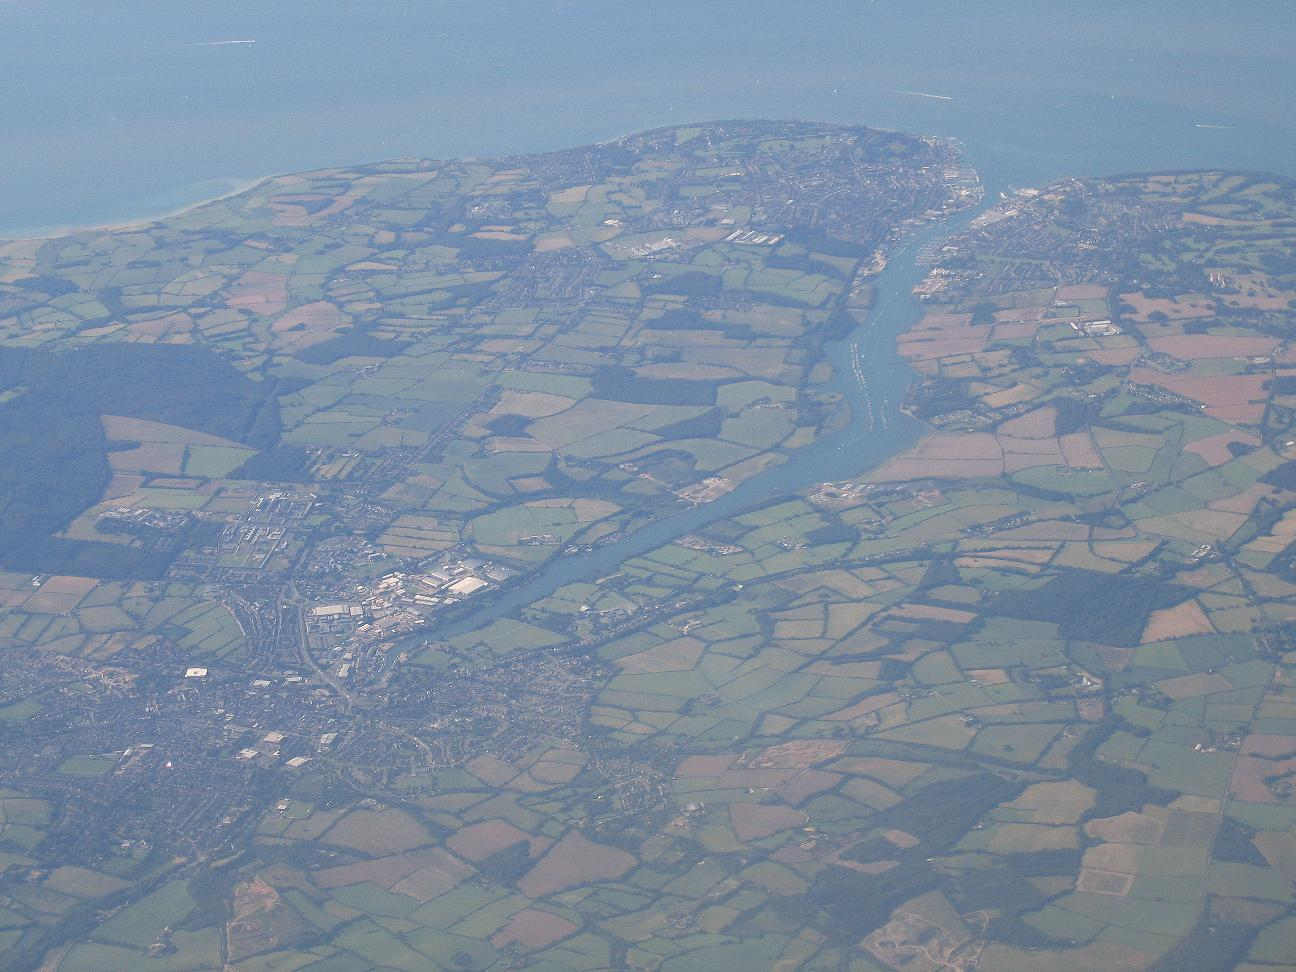 An aerial photograph, showing Newport (bottom left).